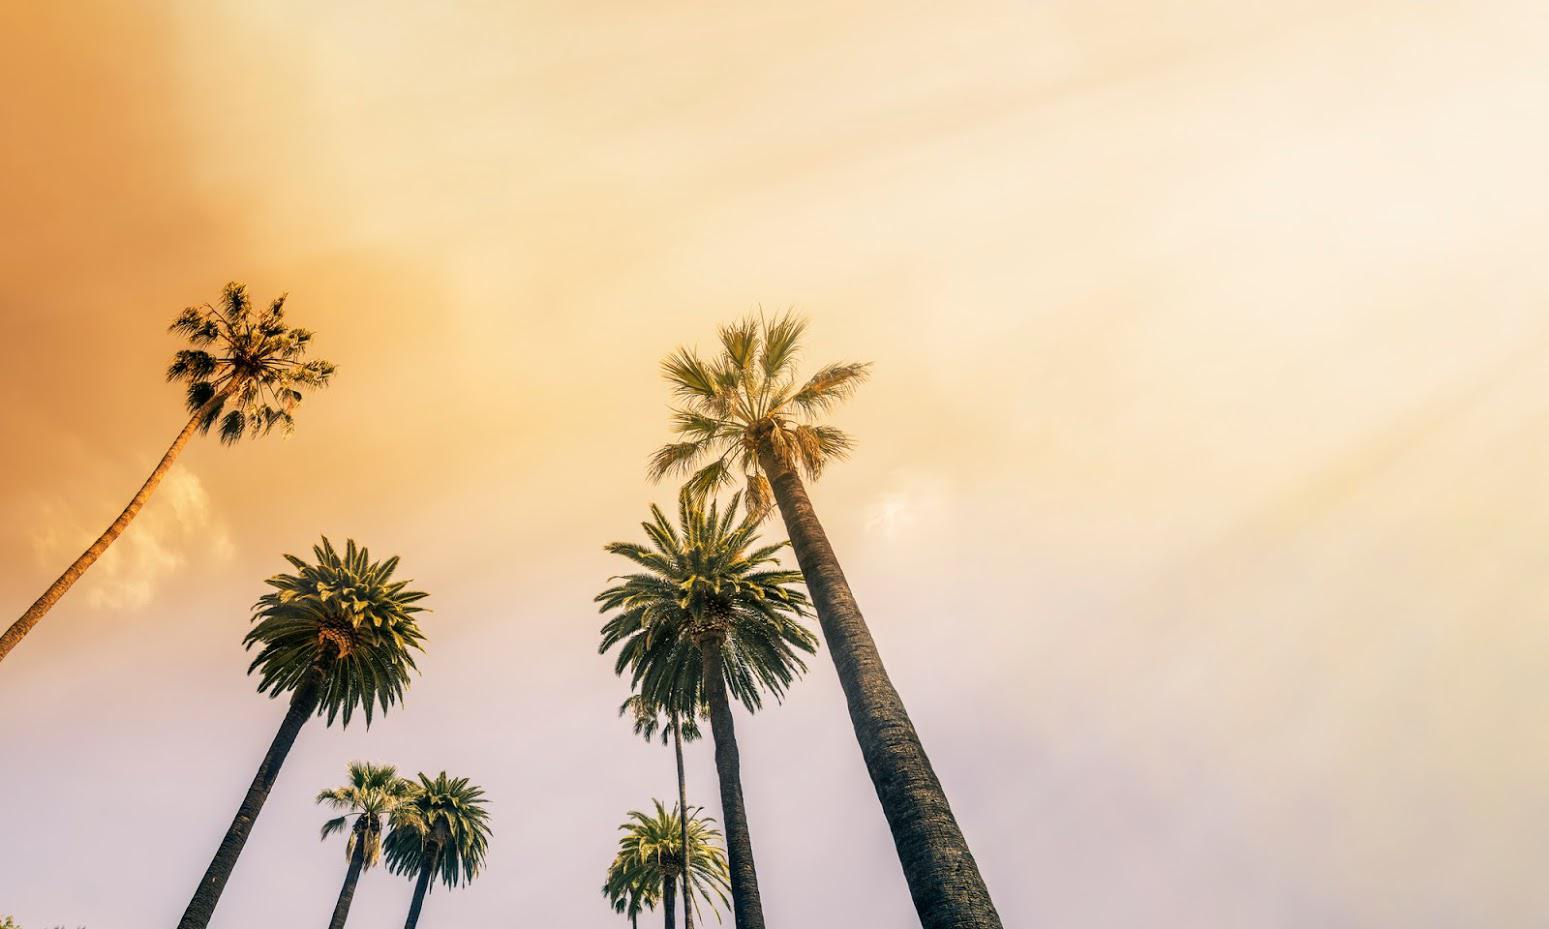 palms trees.jpg